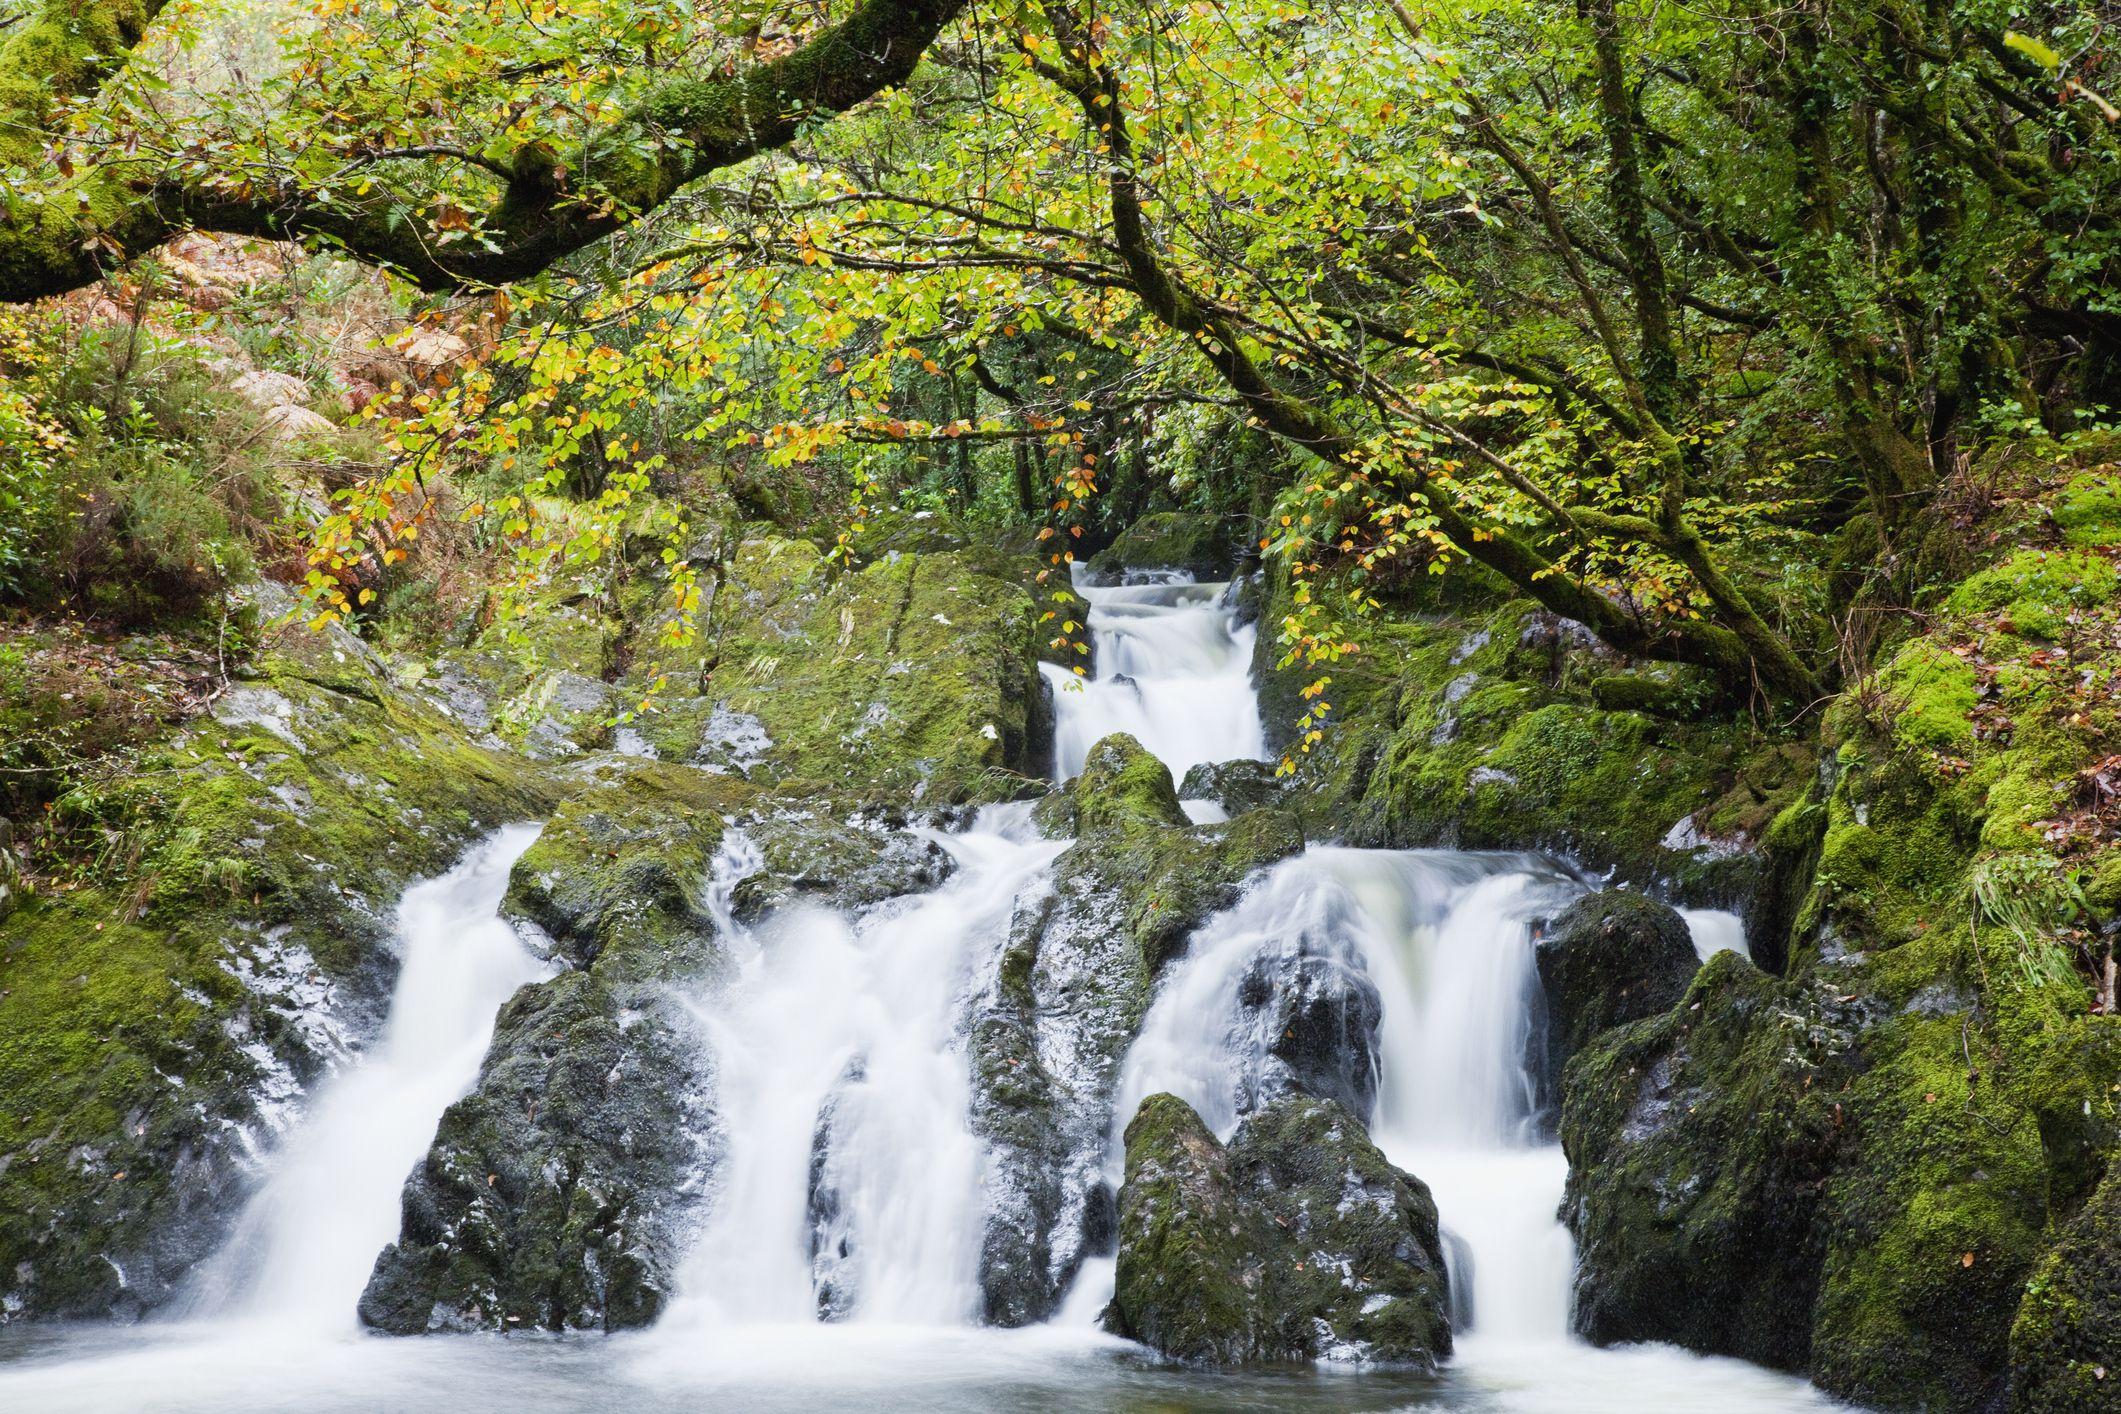 Glengarriff Woods Nature Reserve Beara Peninsula